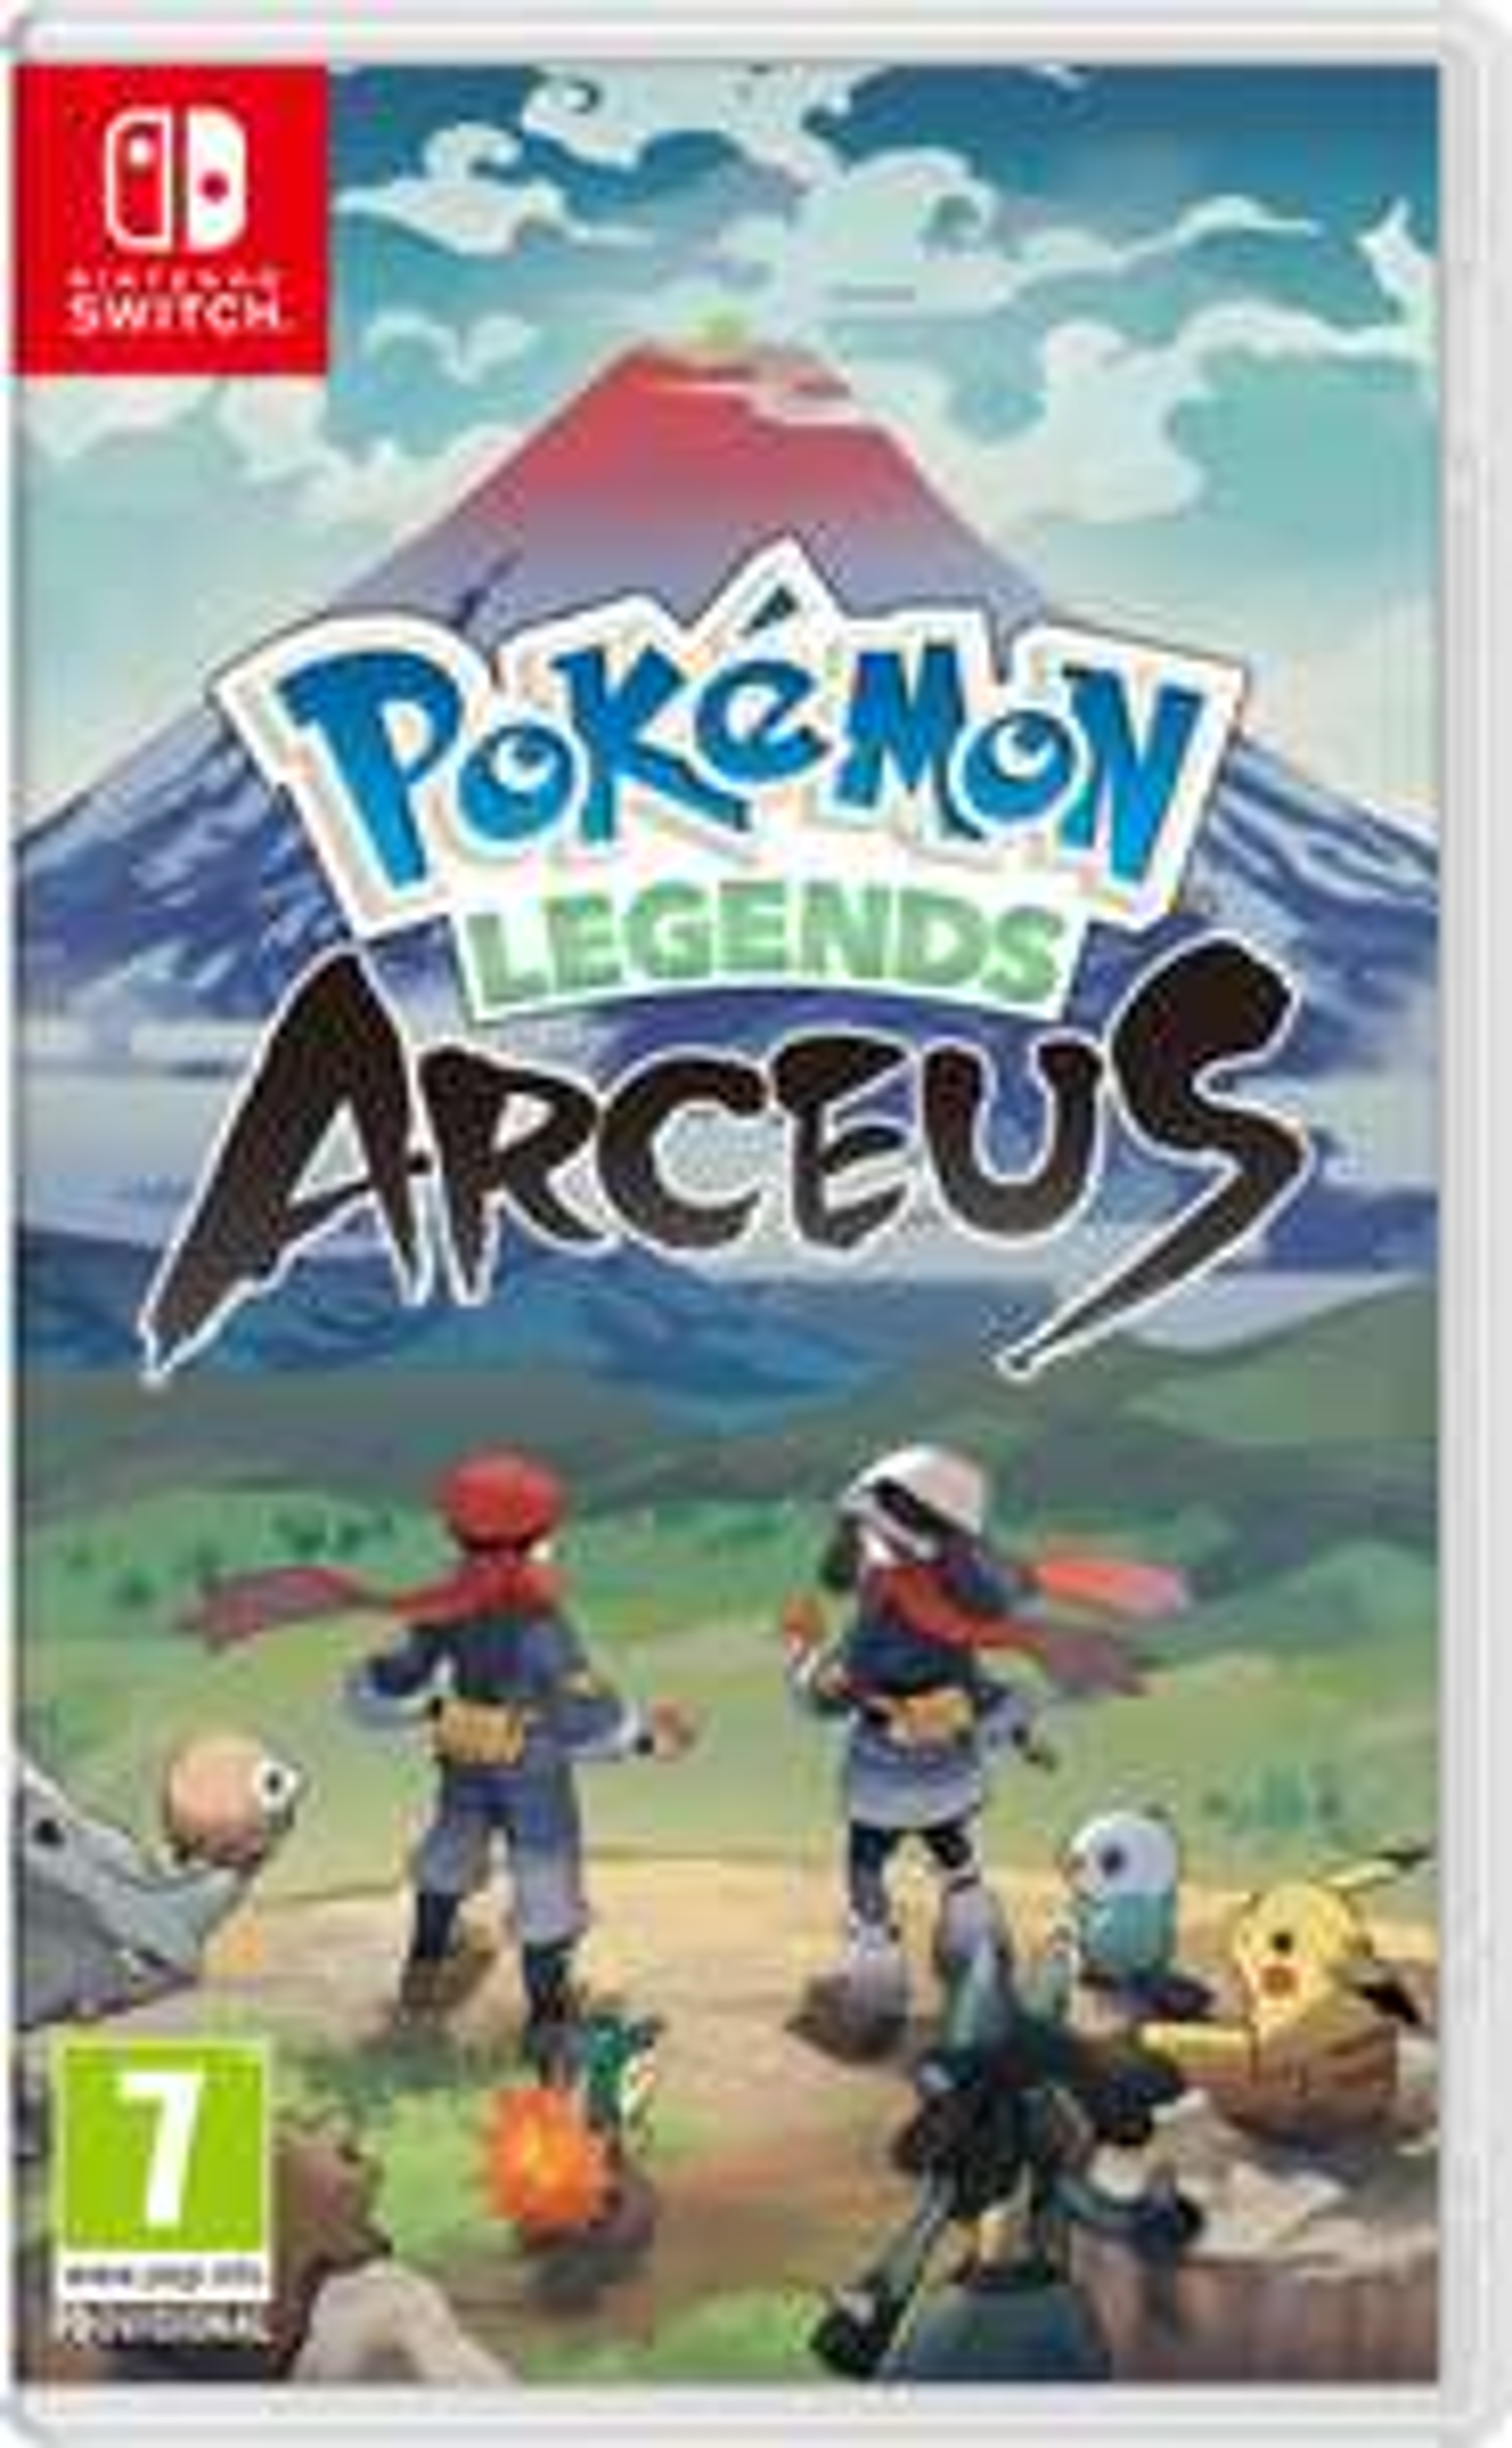 Pokemon Legends Arceus - Nintendo Switch (Pre Order) - £42.85 @ Base